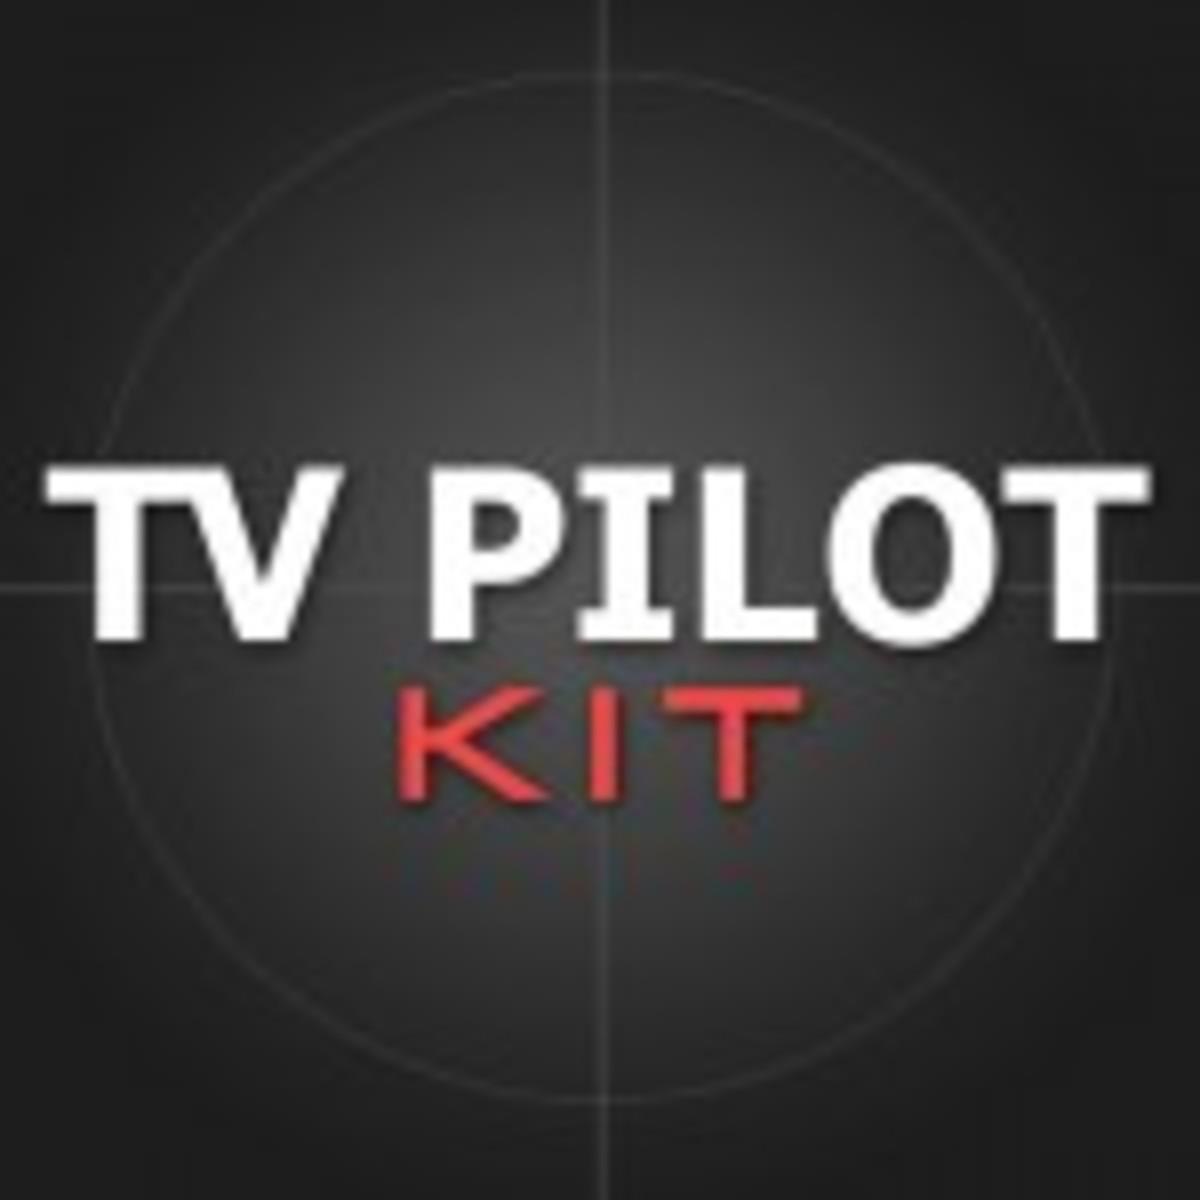 4043_tvpilotkit_medium